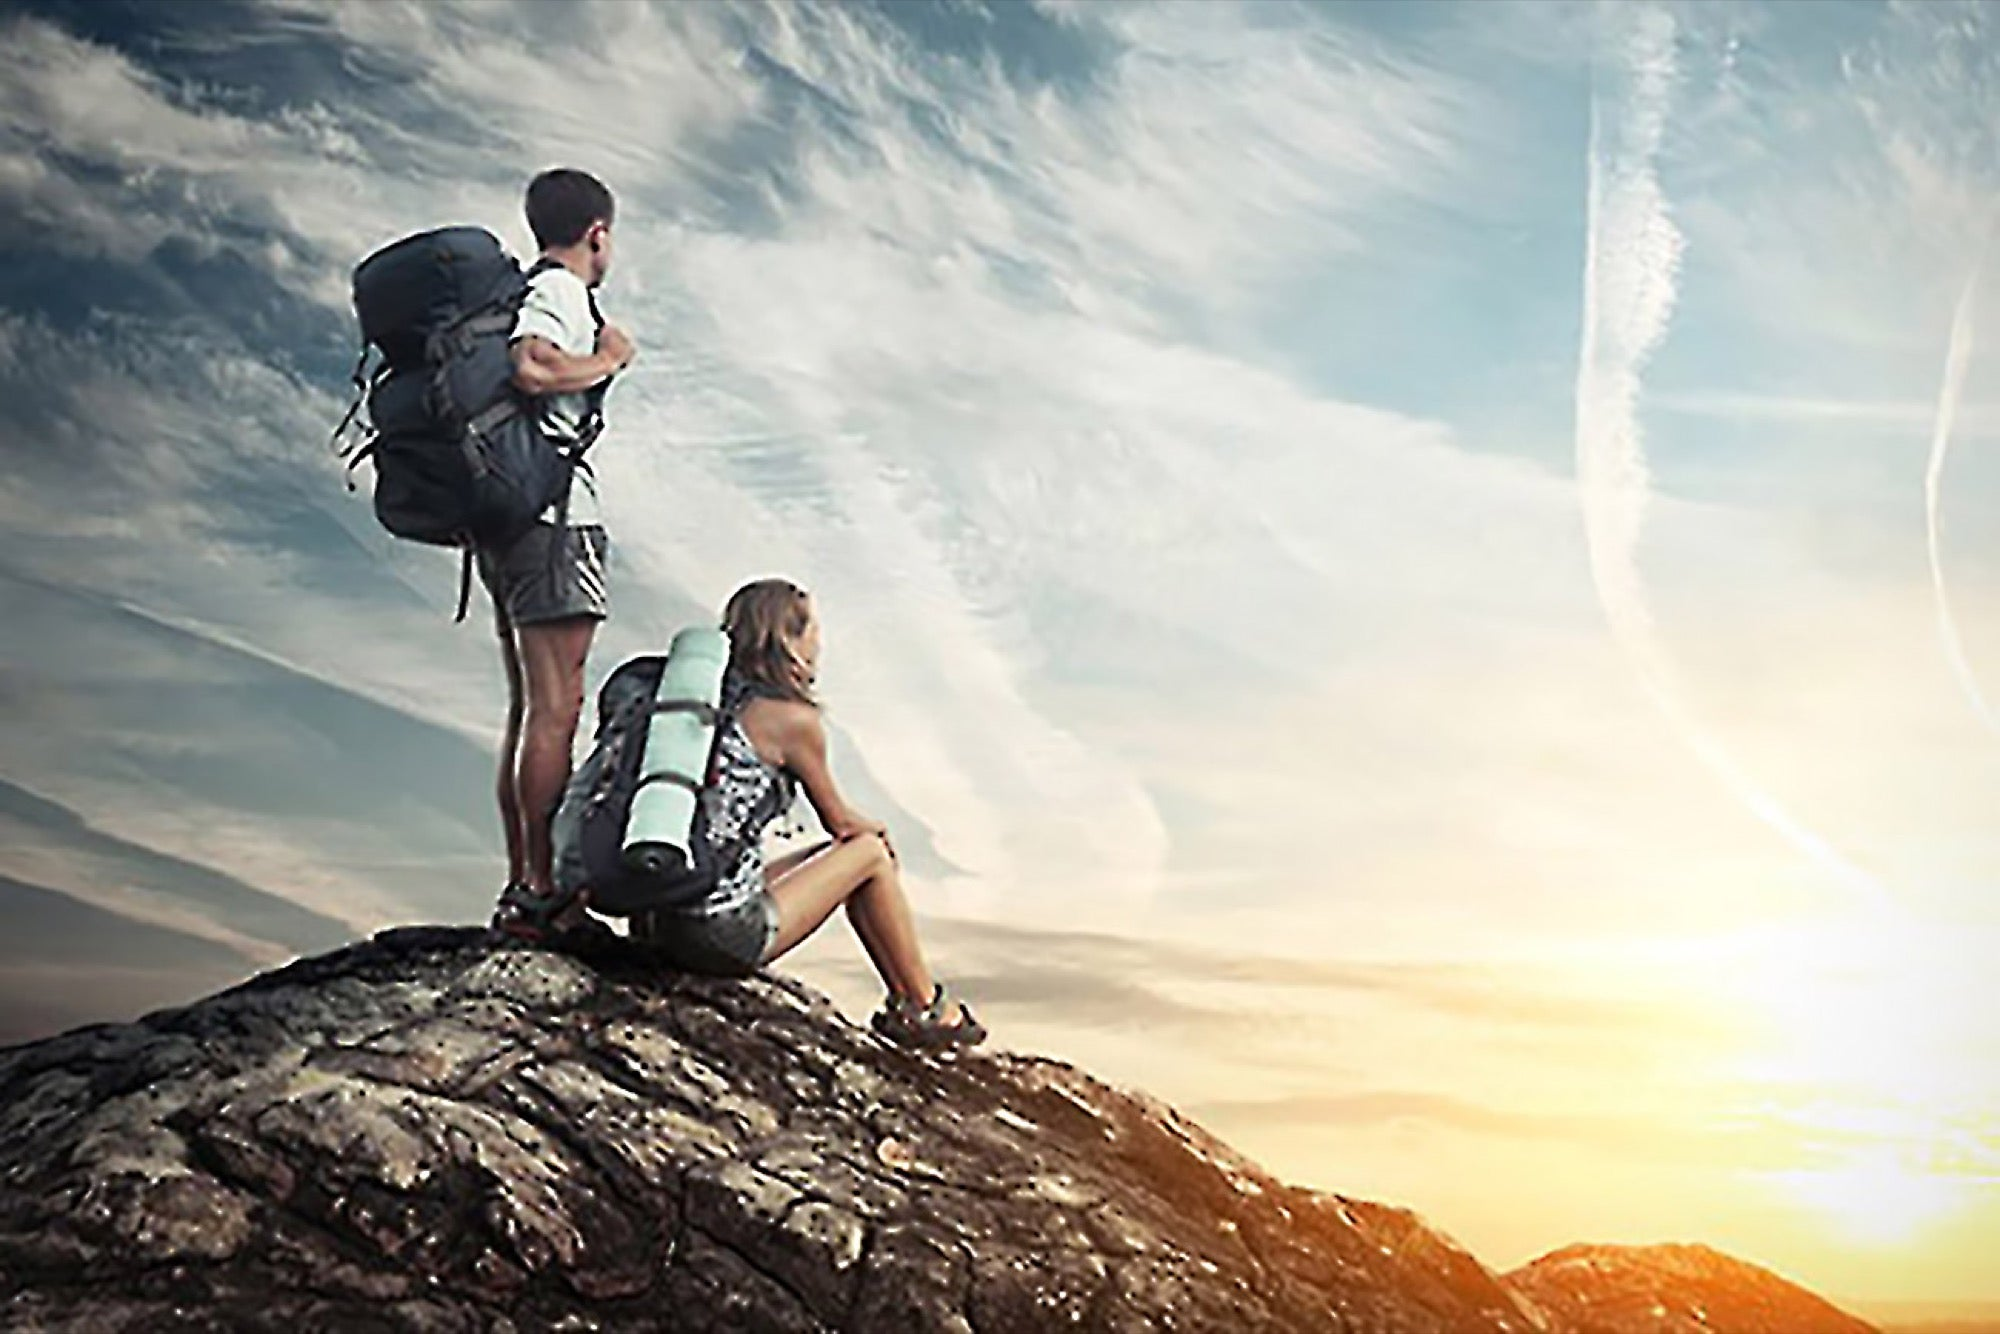 Mountain climbing images 87